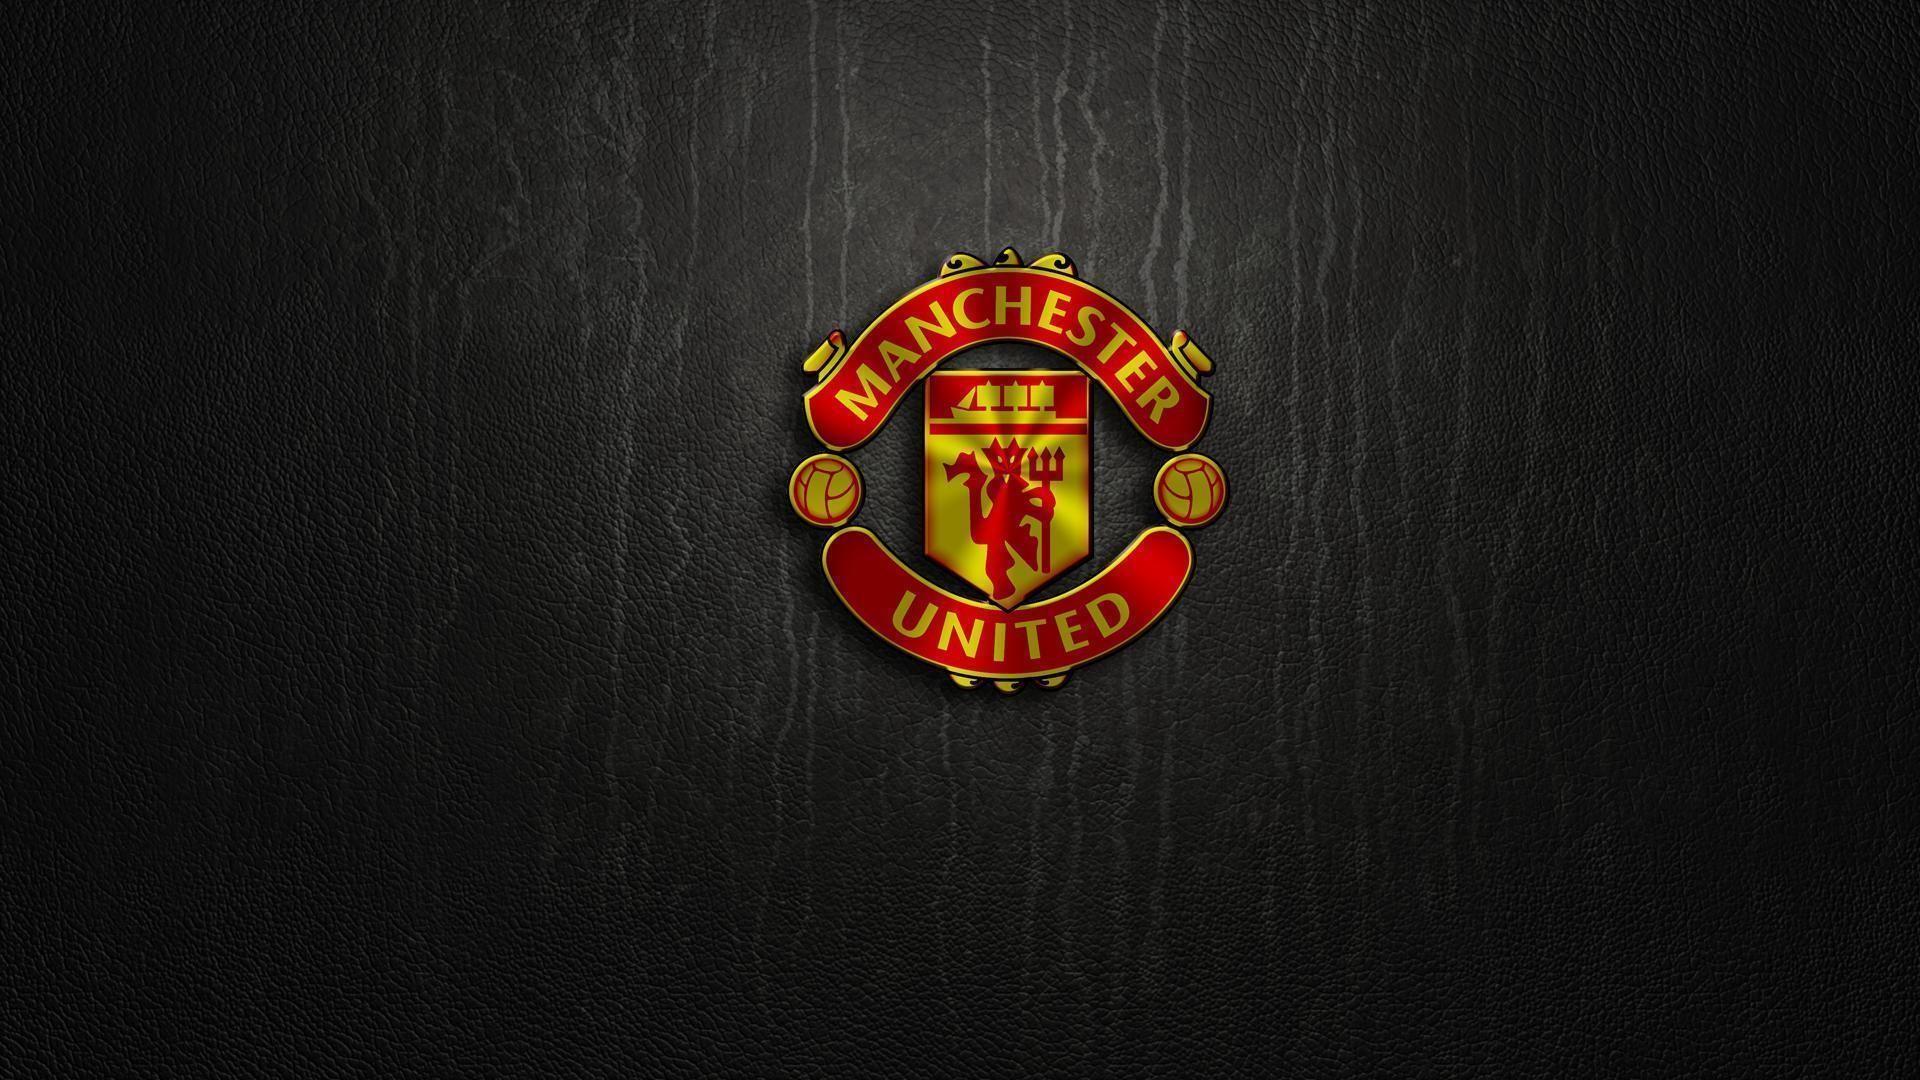 Manchester united wallpaper hd manchester voltagebd Images